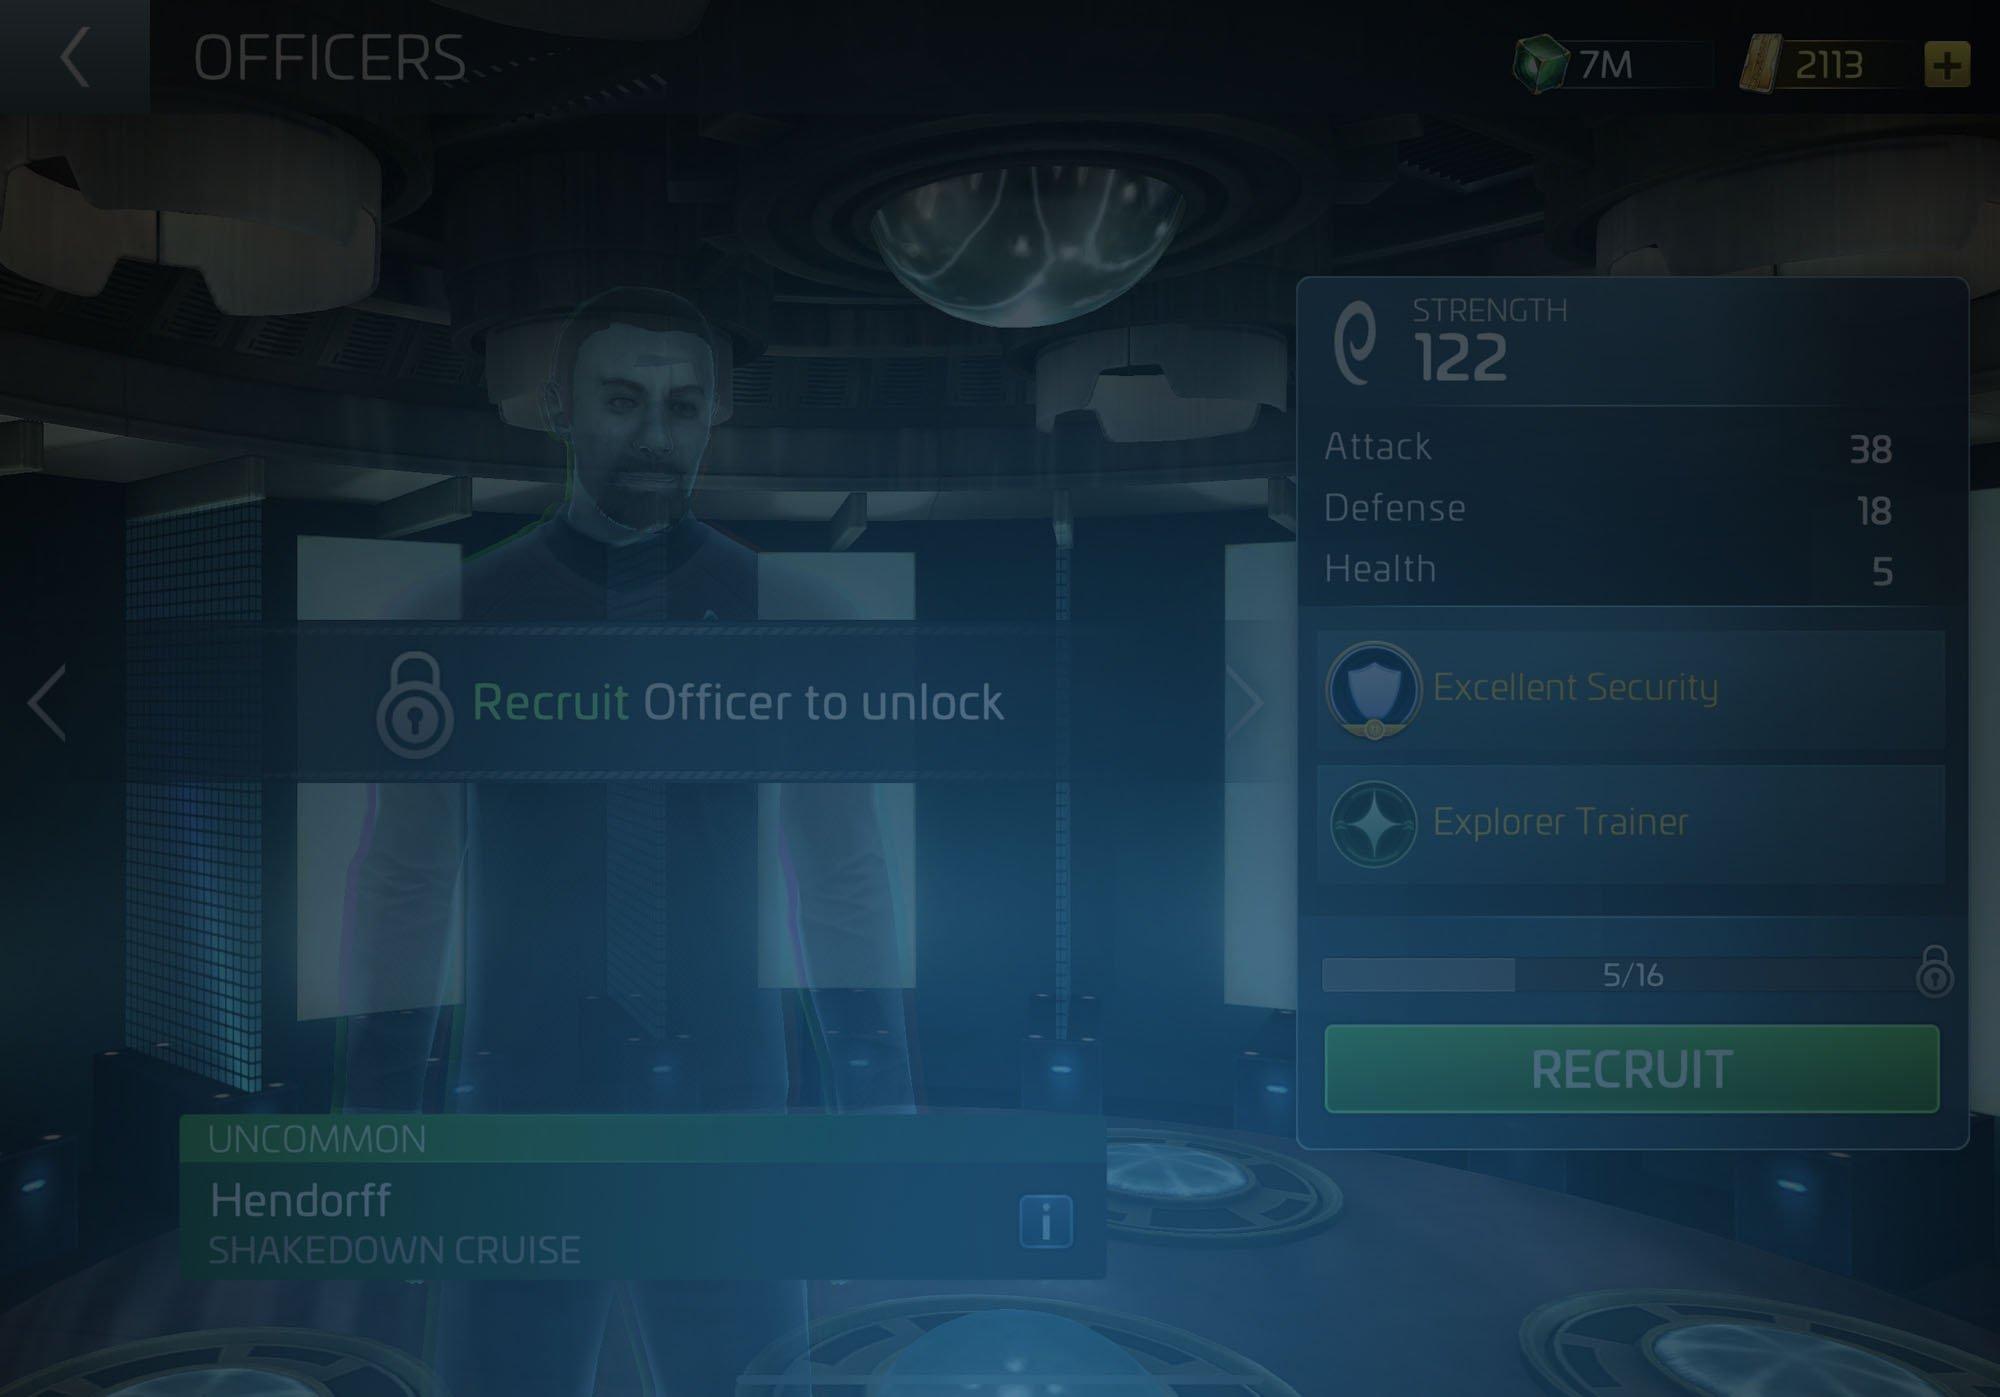 Officer Hendorff